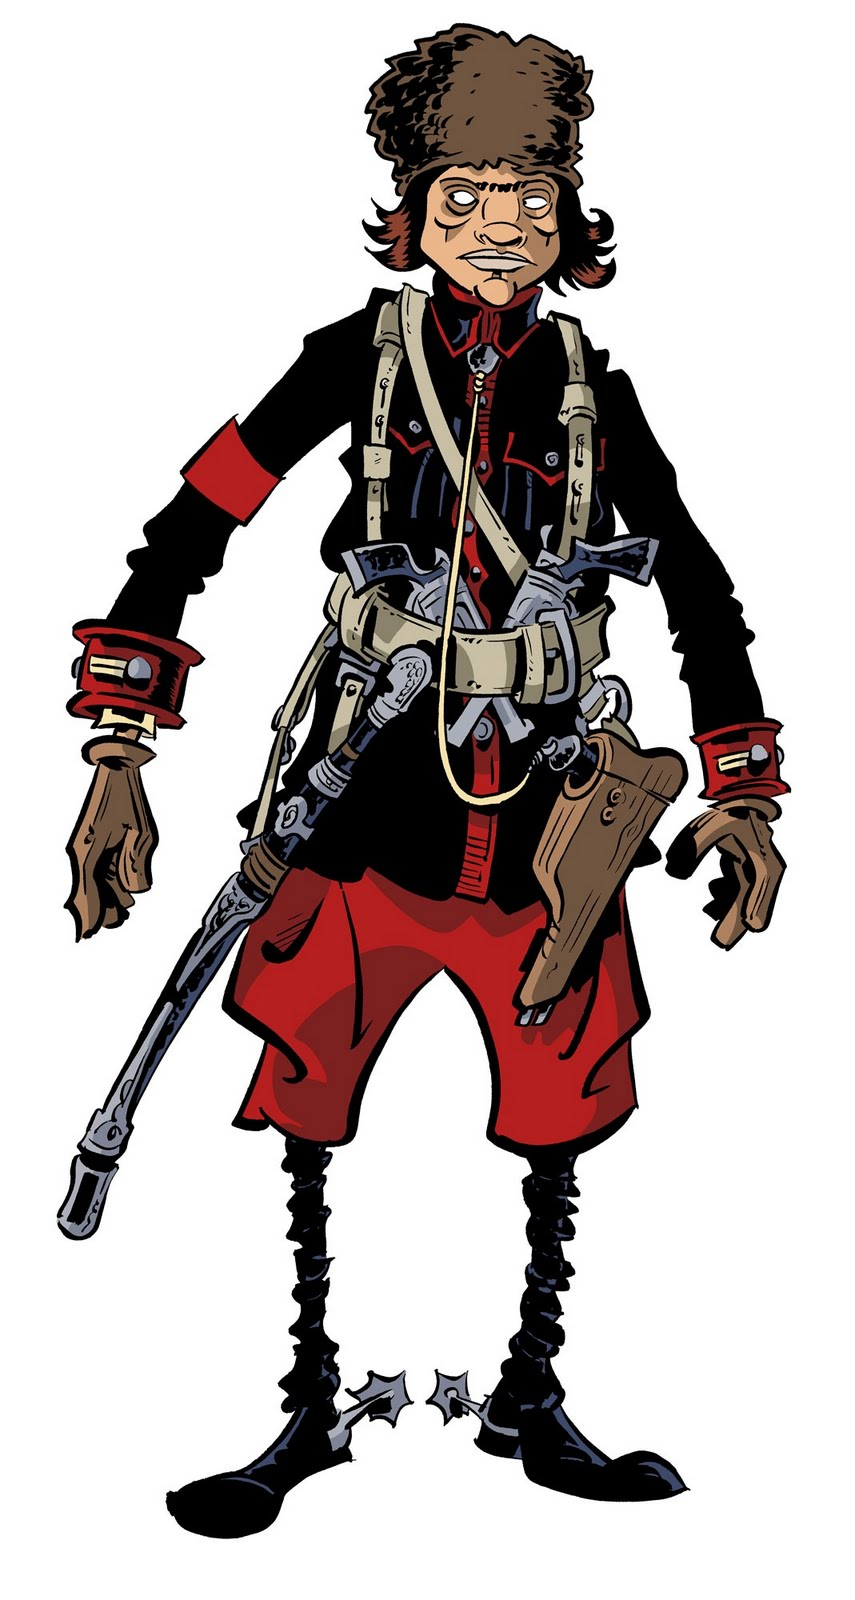 pirates by klosterman rhetoric analysis